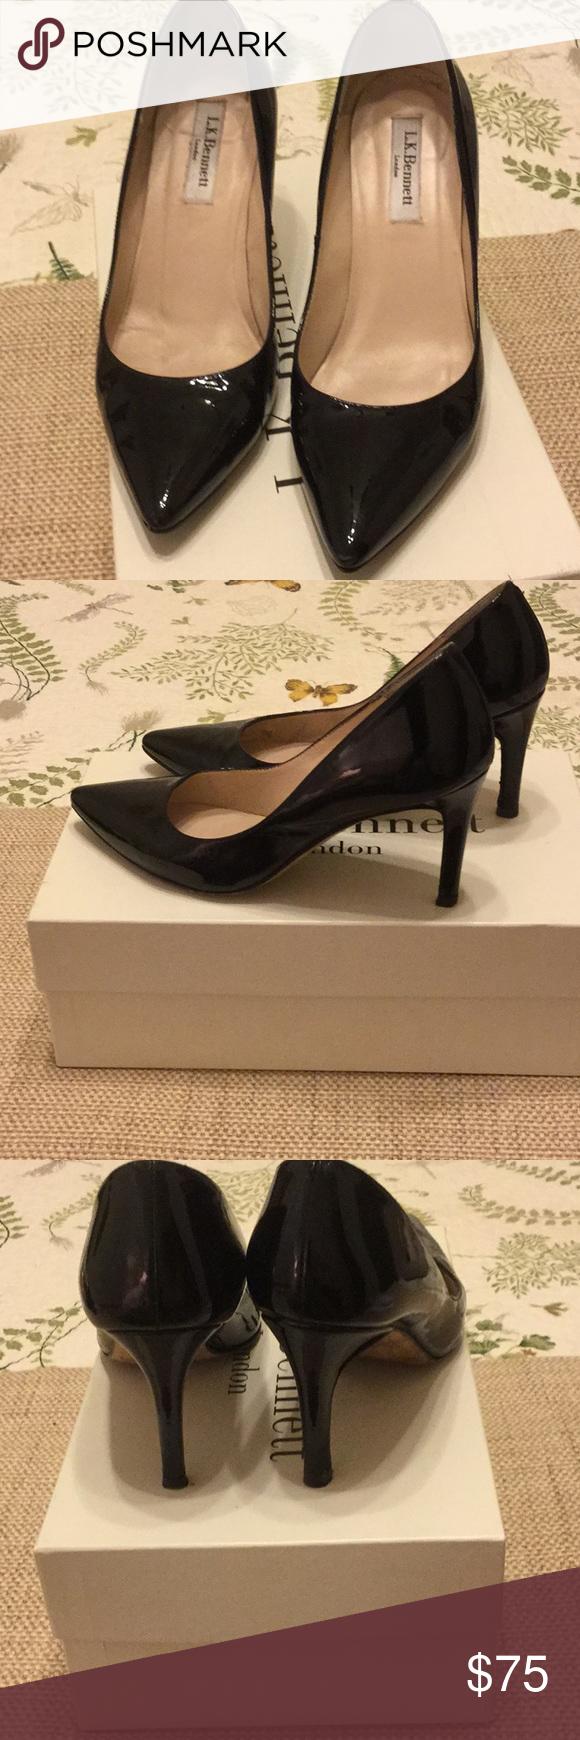 LK BENNETT Floret Black Patent Heels